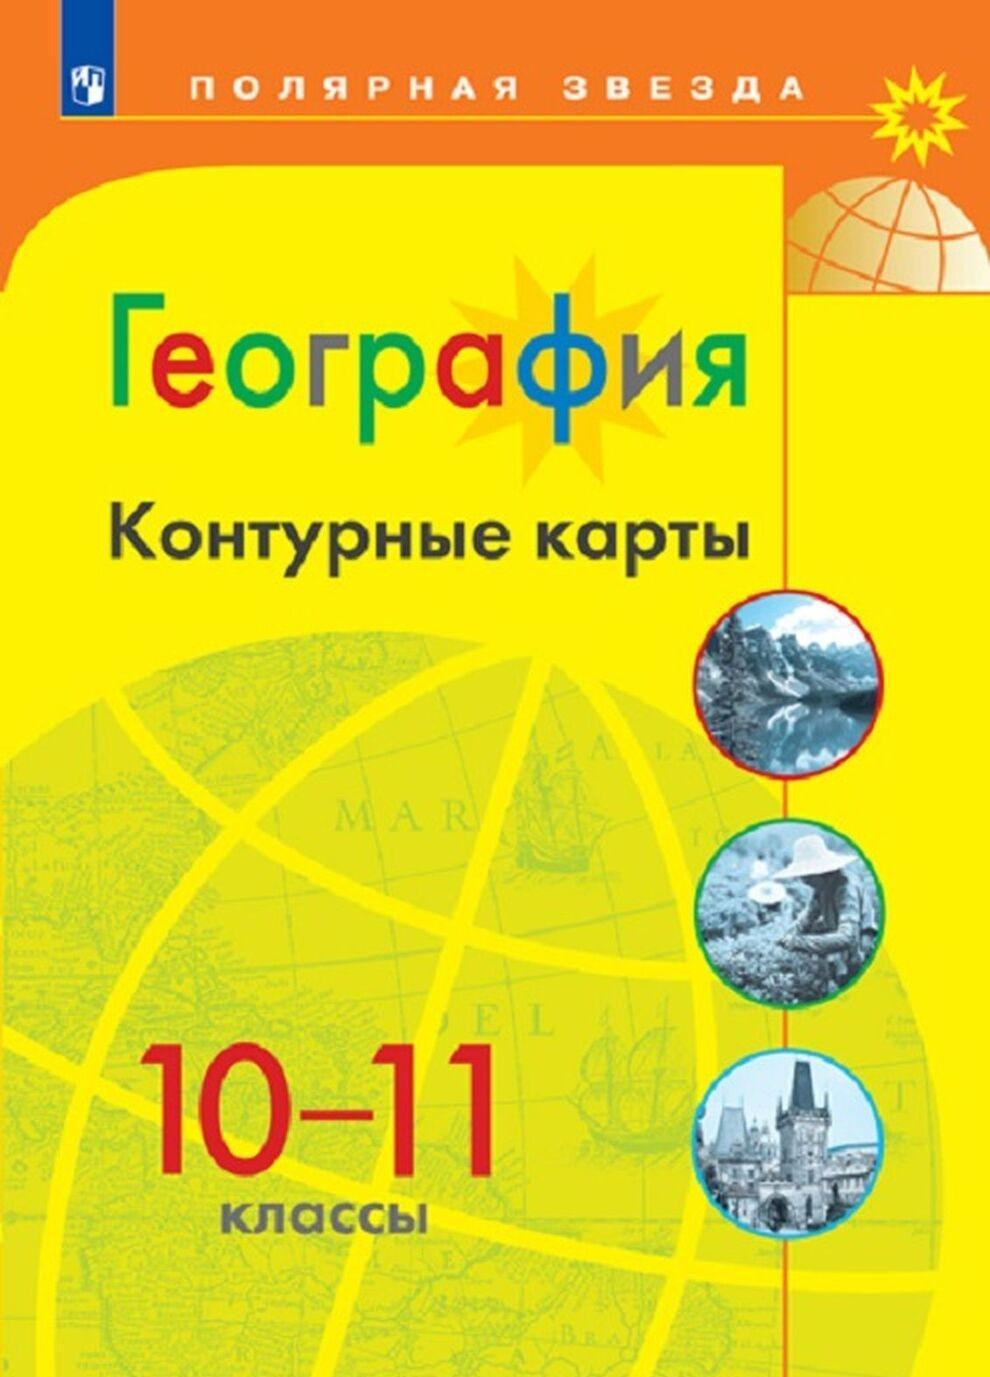 Geografija. Konturnye karty. 10-11 klassy.